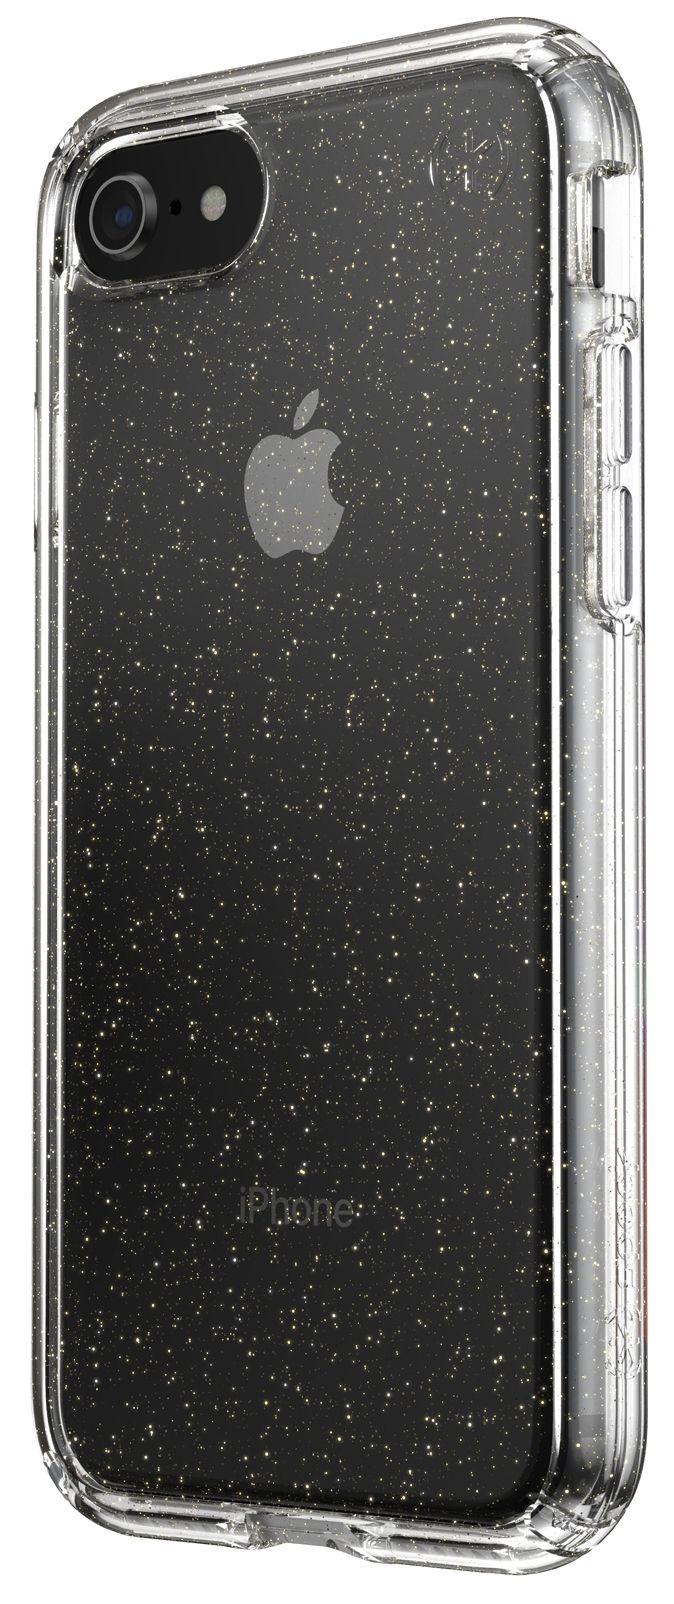 Калъф speck -  iPhone SE, 8,7, Gold Gliter, прозрачен - 6